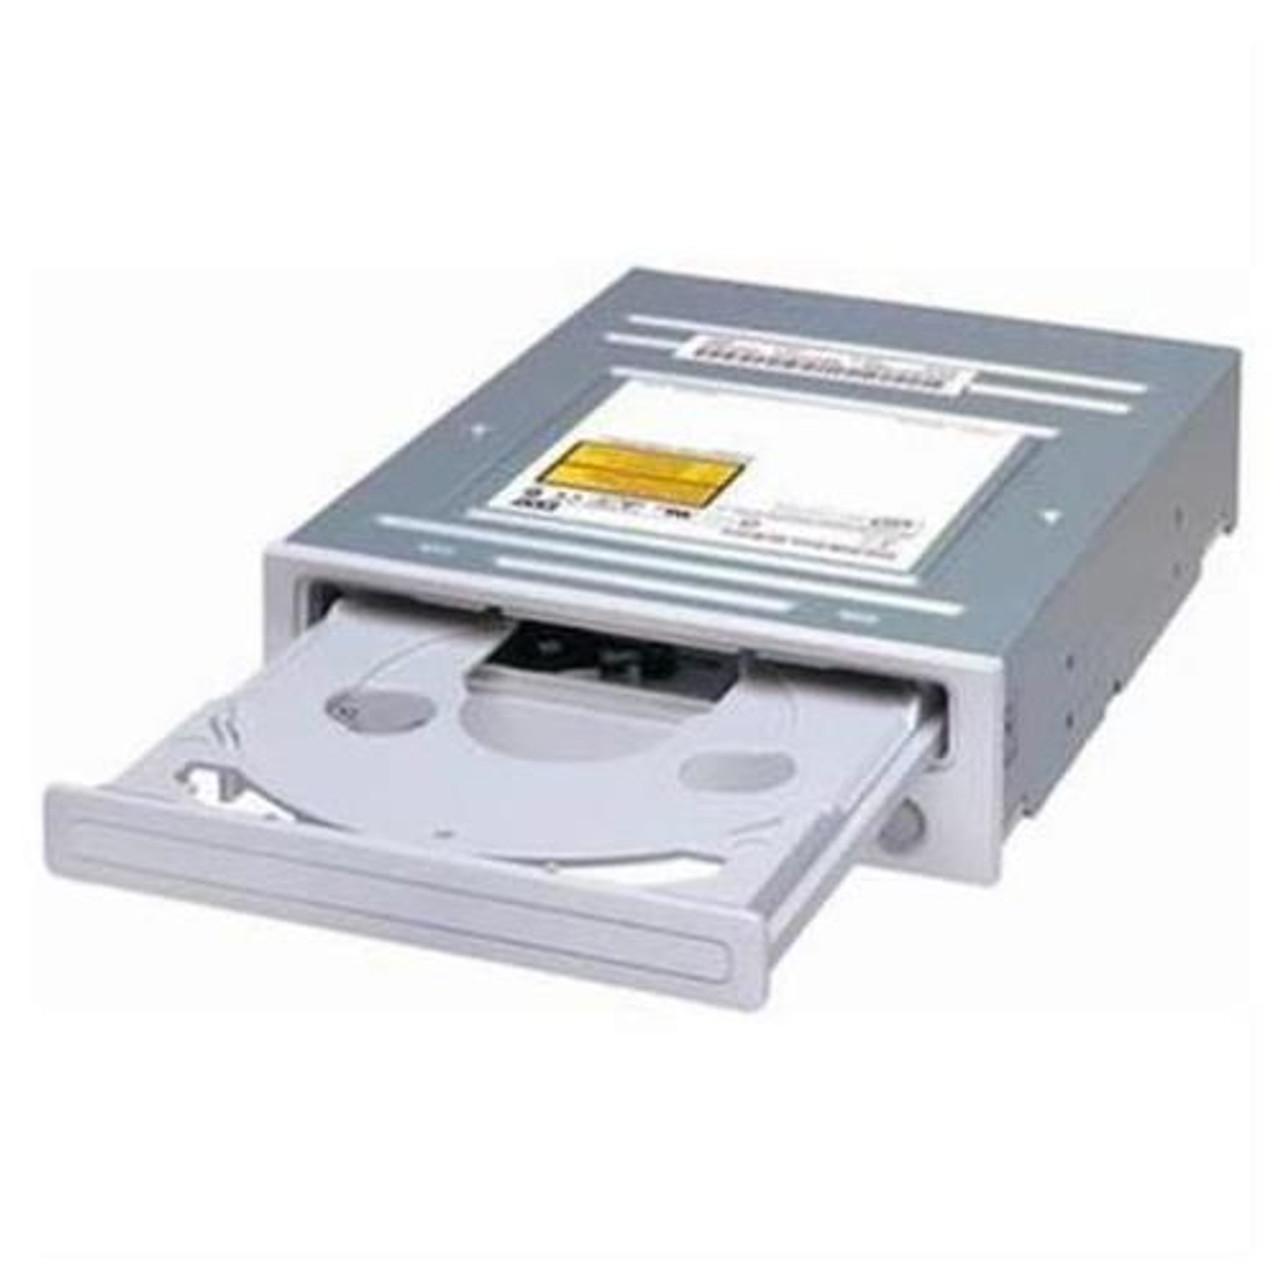 24XCD-RW Slimline Drive 390-0443 Sun X4358A-Z SATA 8X DVD-RW